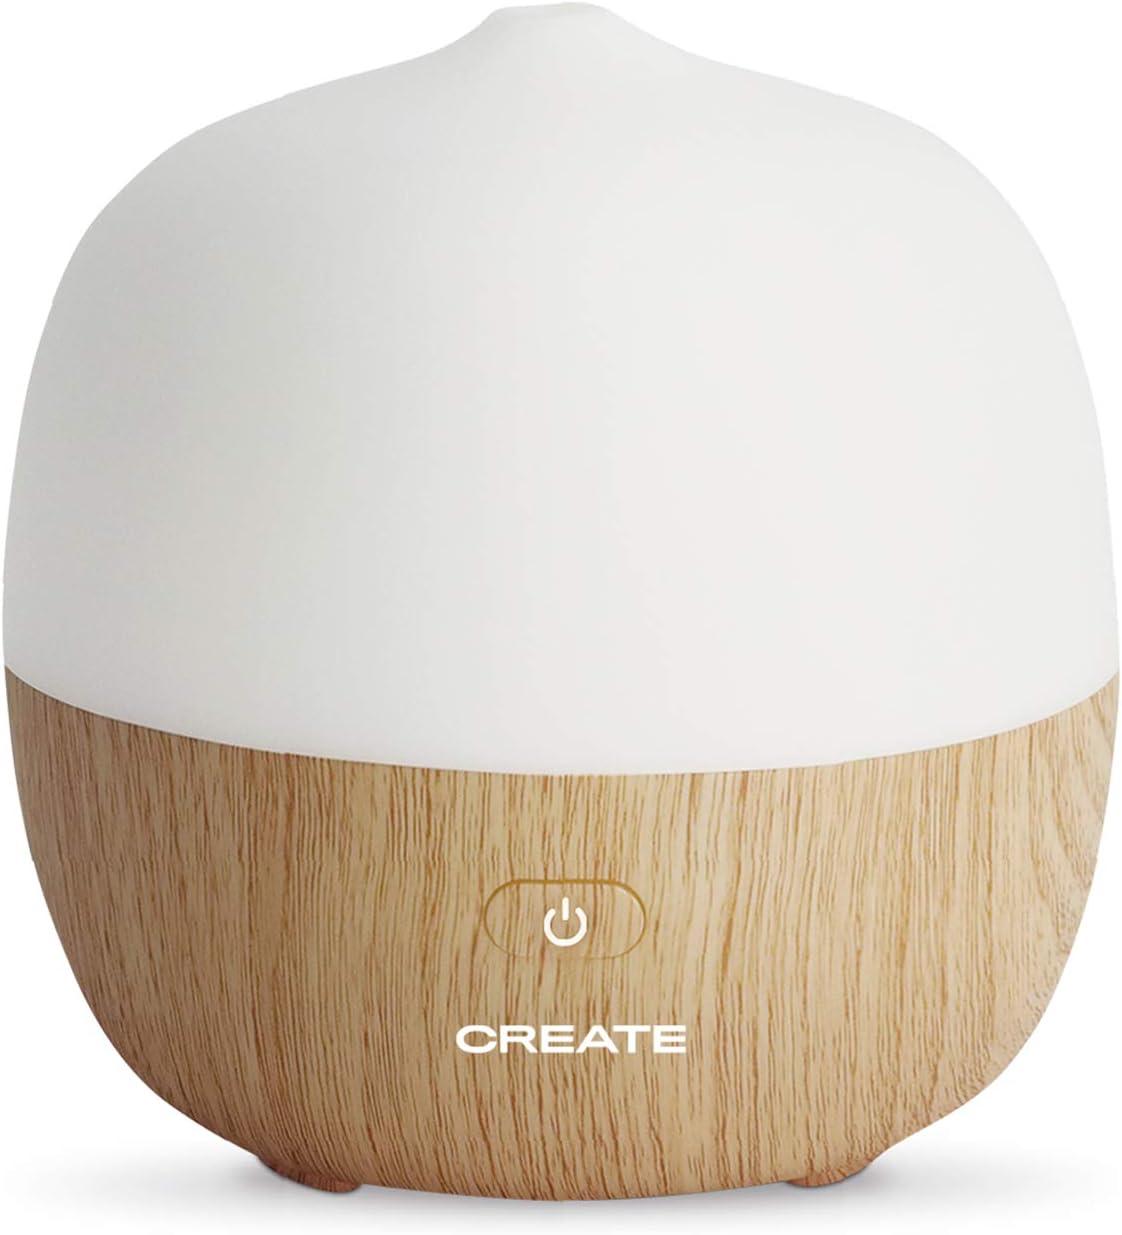 IKOHS AROMA STUDIO - Difusor de aromas y humidificador, Emite Vapor Frio con propiedades Humectantes y de Aromaterapia, 7 colores de luces LED programables, Función de Aromaterapia (Madera Natural)